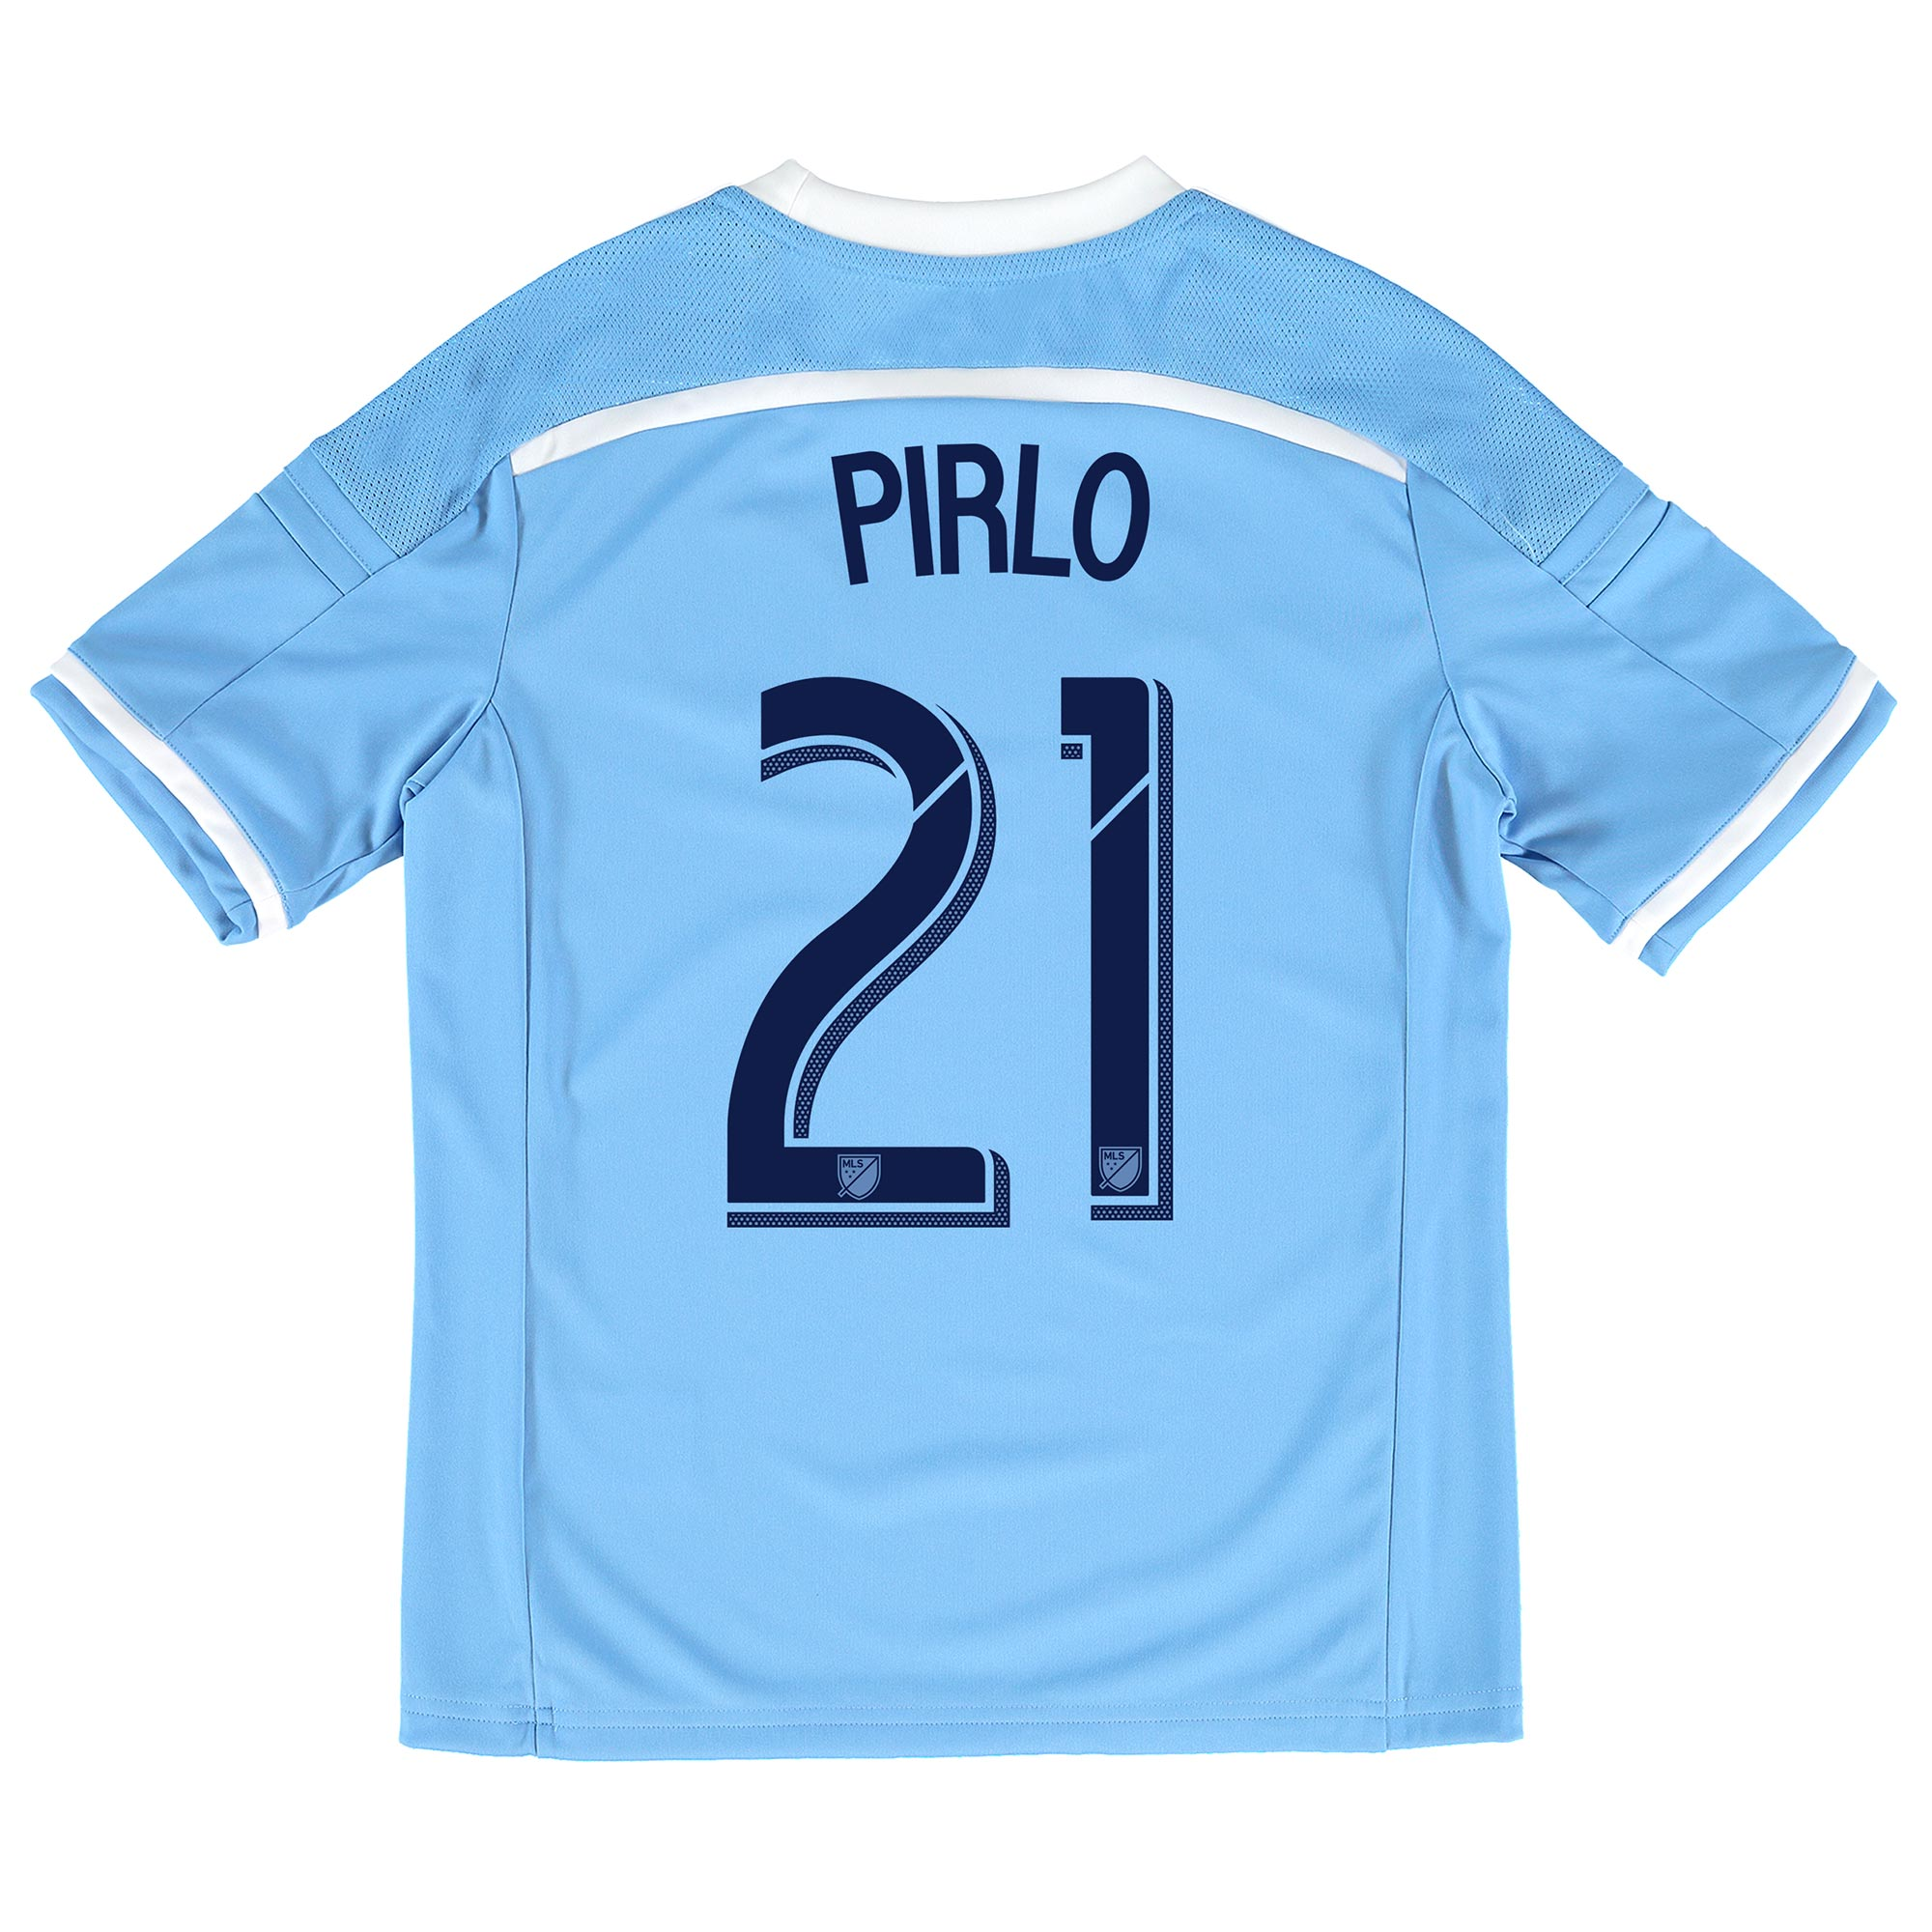 New York City FC Home Shirt 2015-16 - Kids with Andrea Pirlo 21 printi